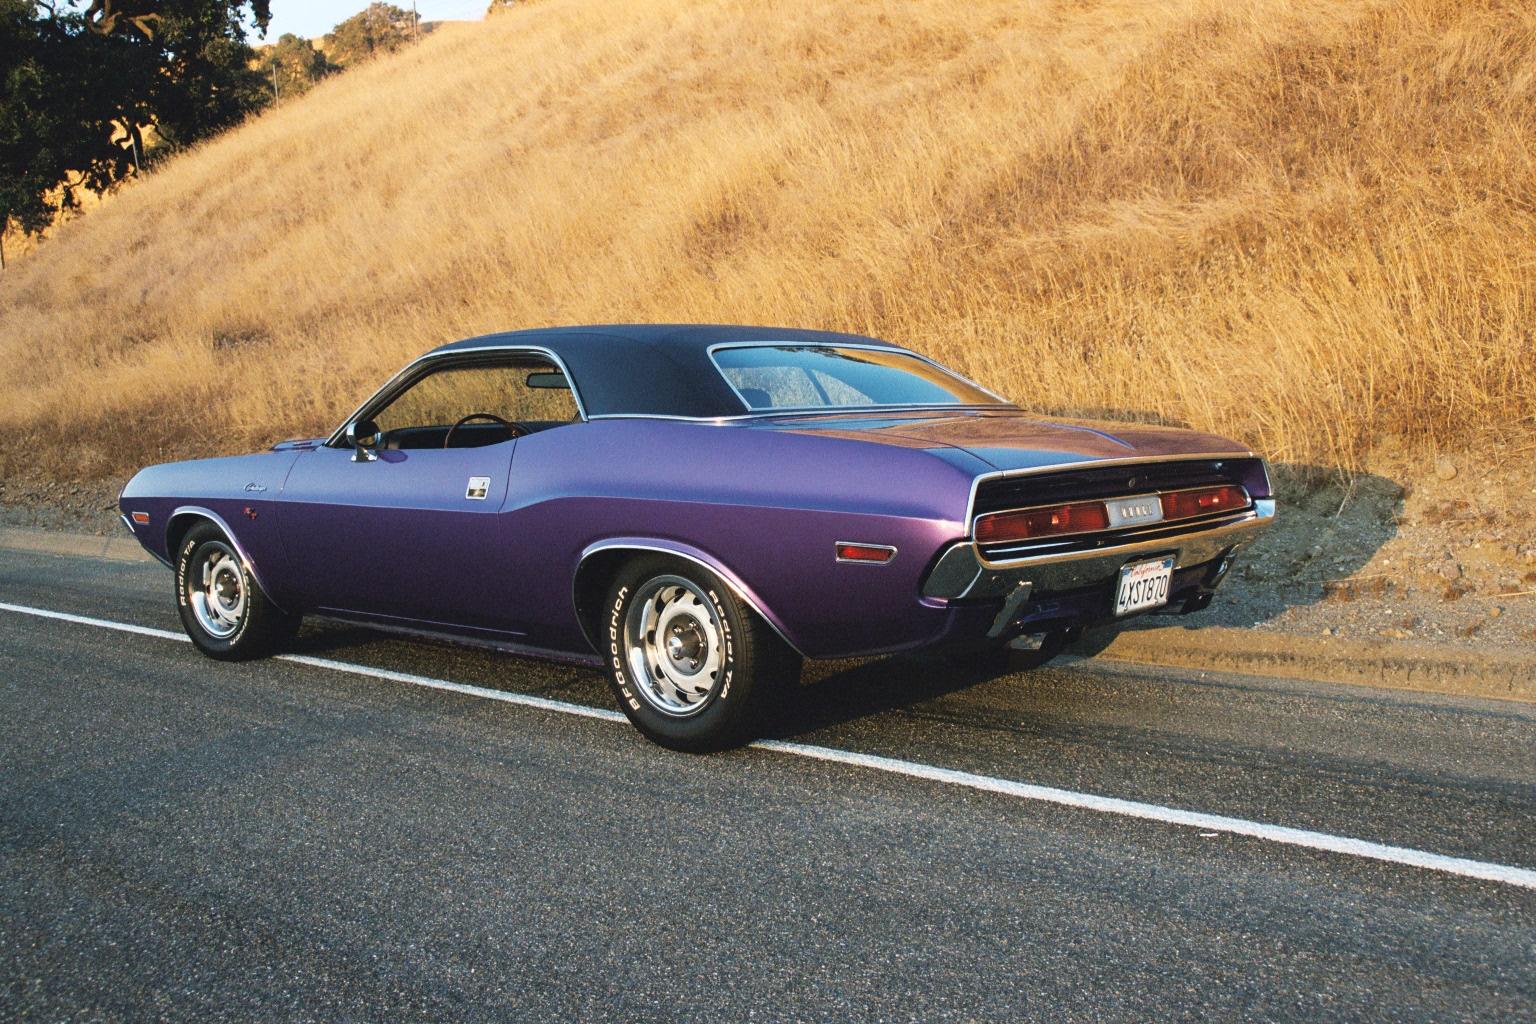 1970 Dodge Challenger   Pictures   CarGurus 1536x1024